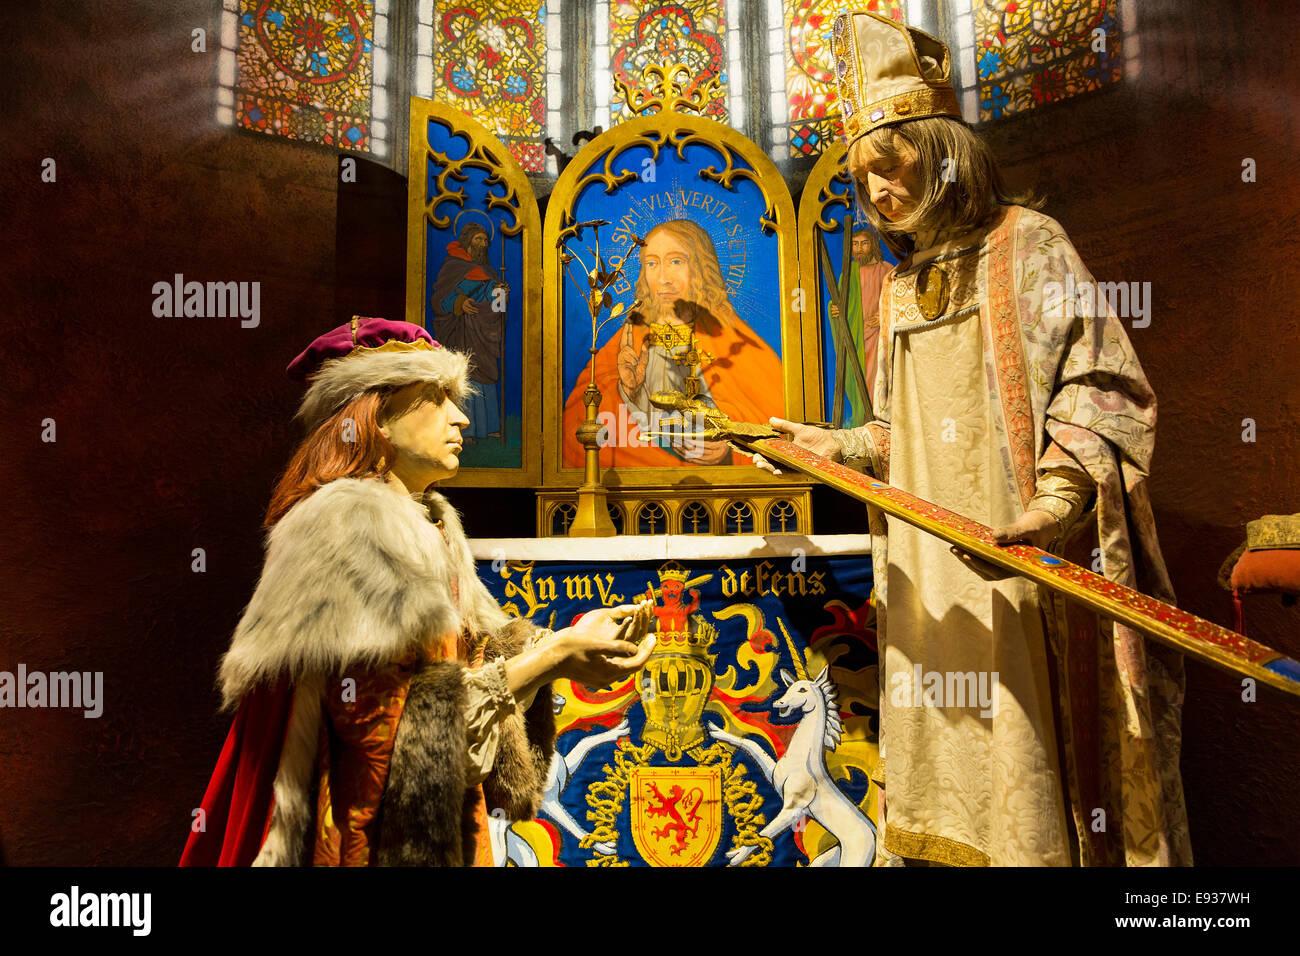 Edinburgh Castle, Royal Palace, King James IV receives sword of State - Stock Image